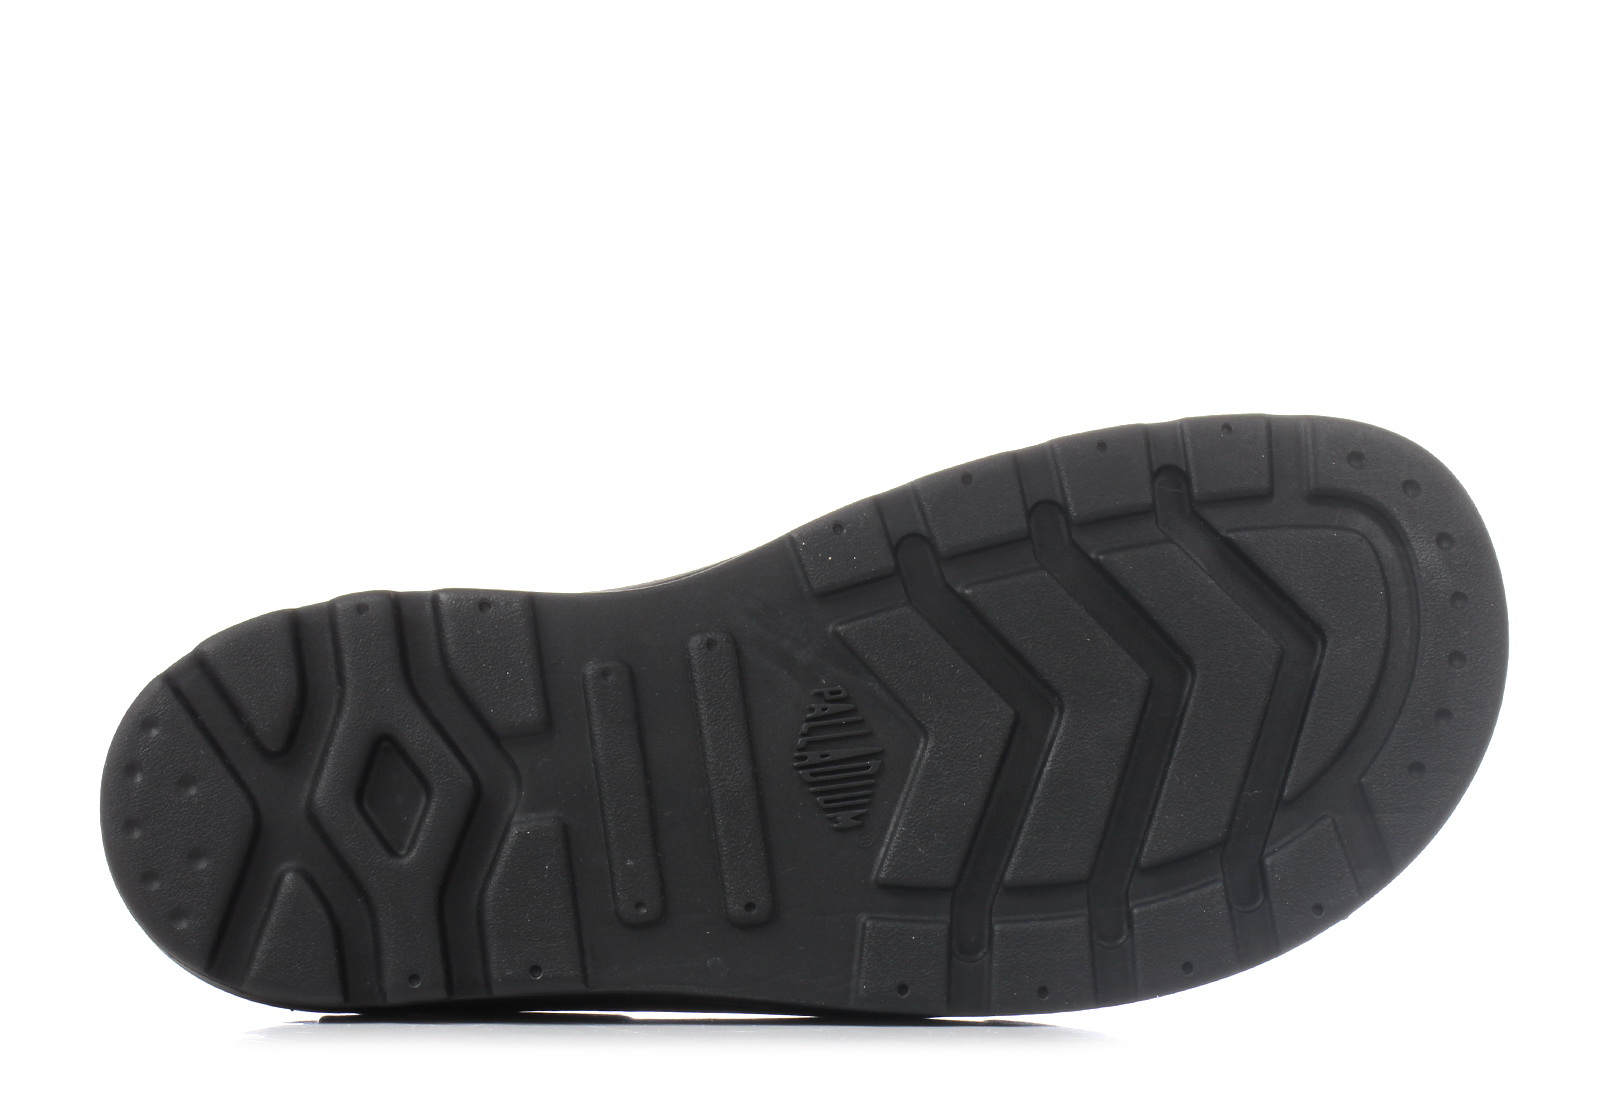 0ba67ea7f Palladium Sandals - Solea Overstrap 47 - 96279-008-M - Online shop ...